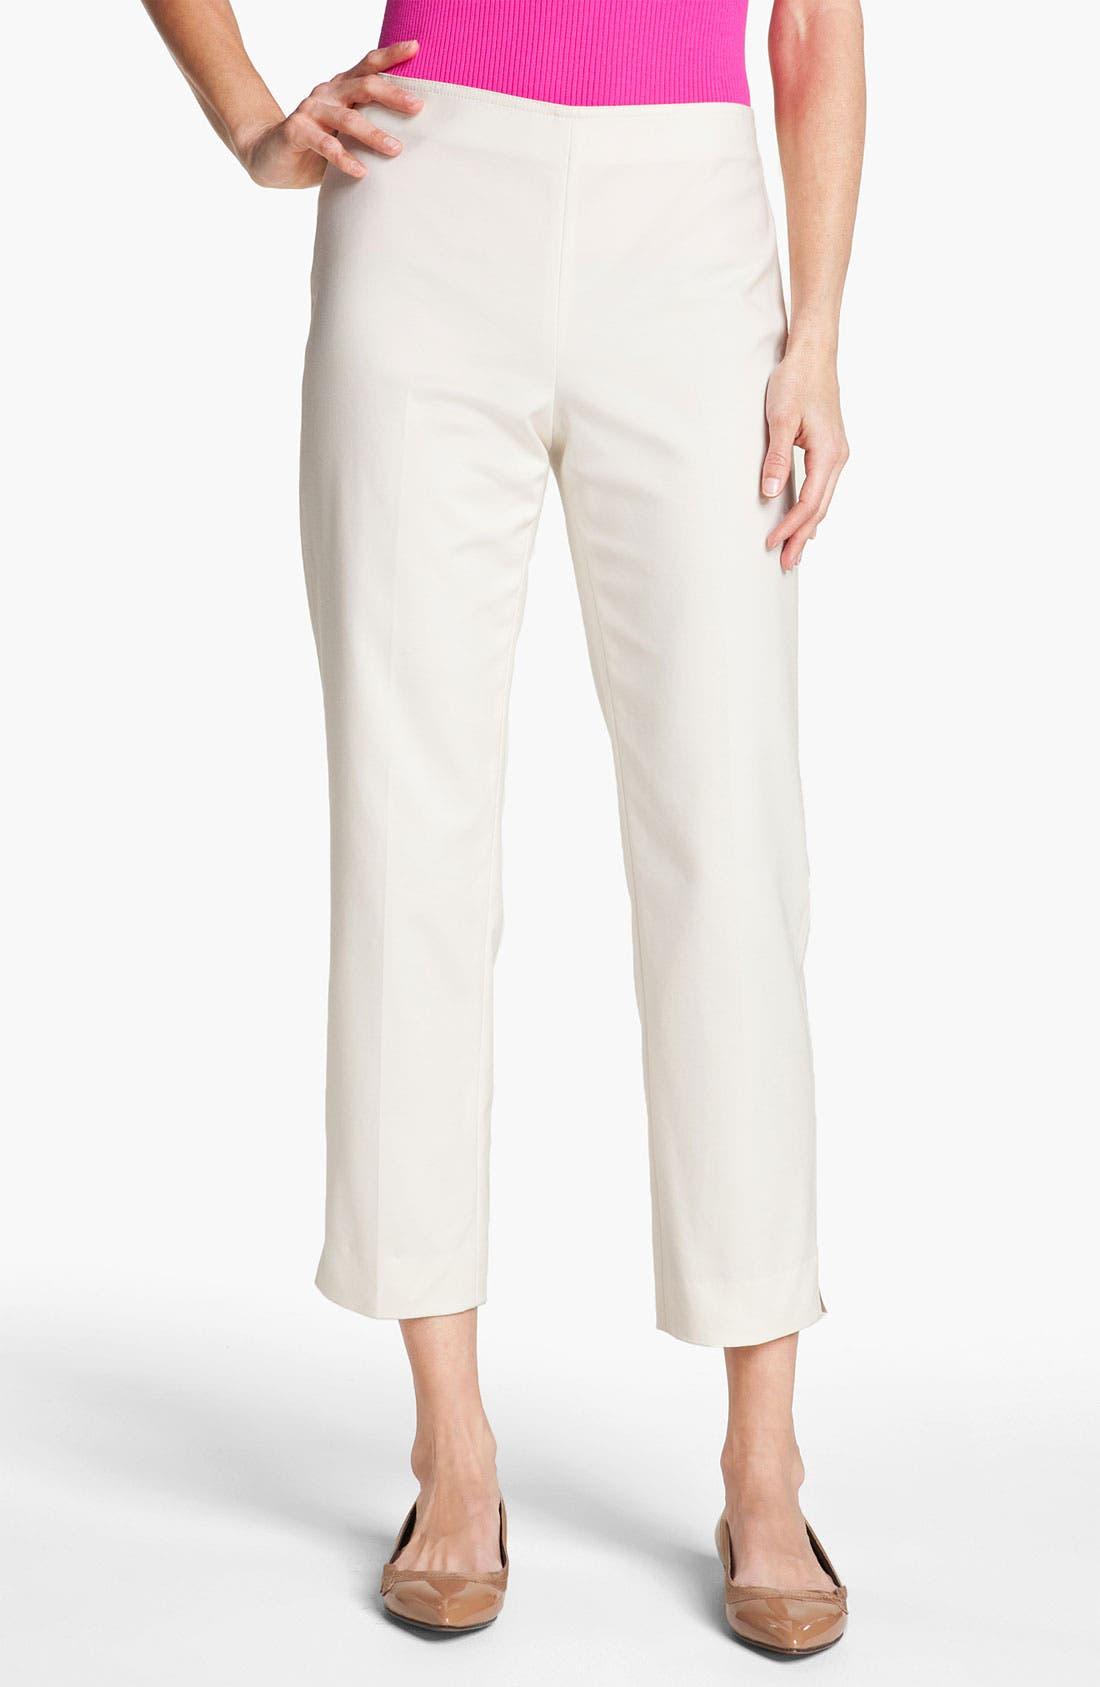 Alternate Image 1 Selected - St. John Yellow Label 'Audrey' Double Weave Stretch Cotton Capri Pants